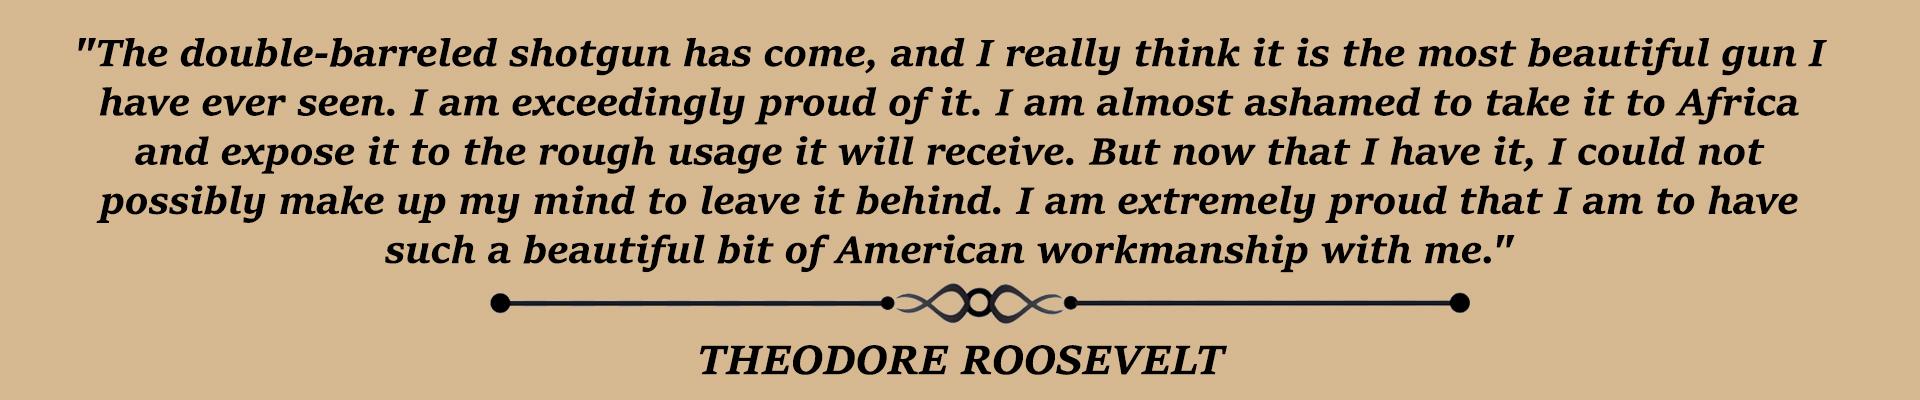 theodore-roosevelt-quote.jpg